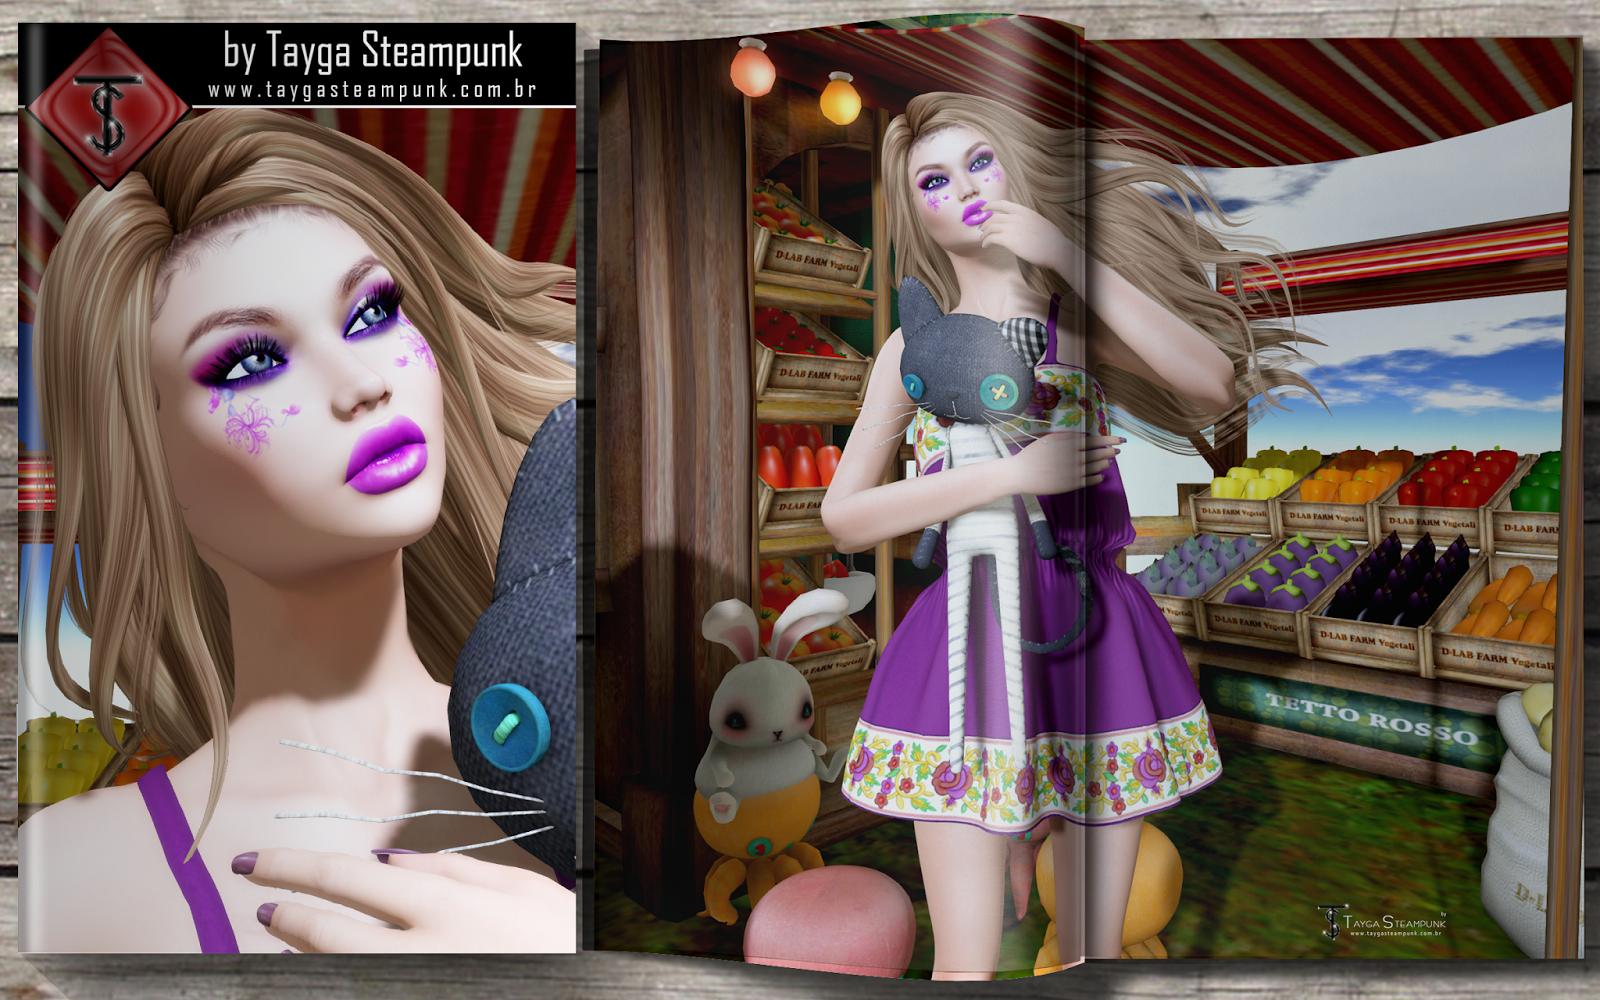 TS# 214 Violeta